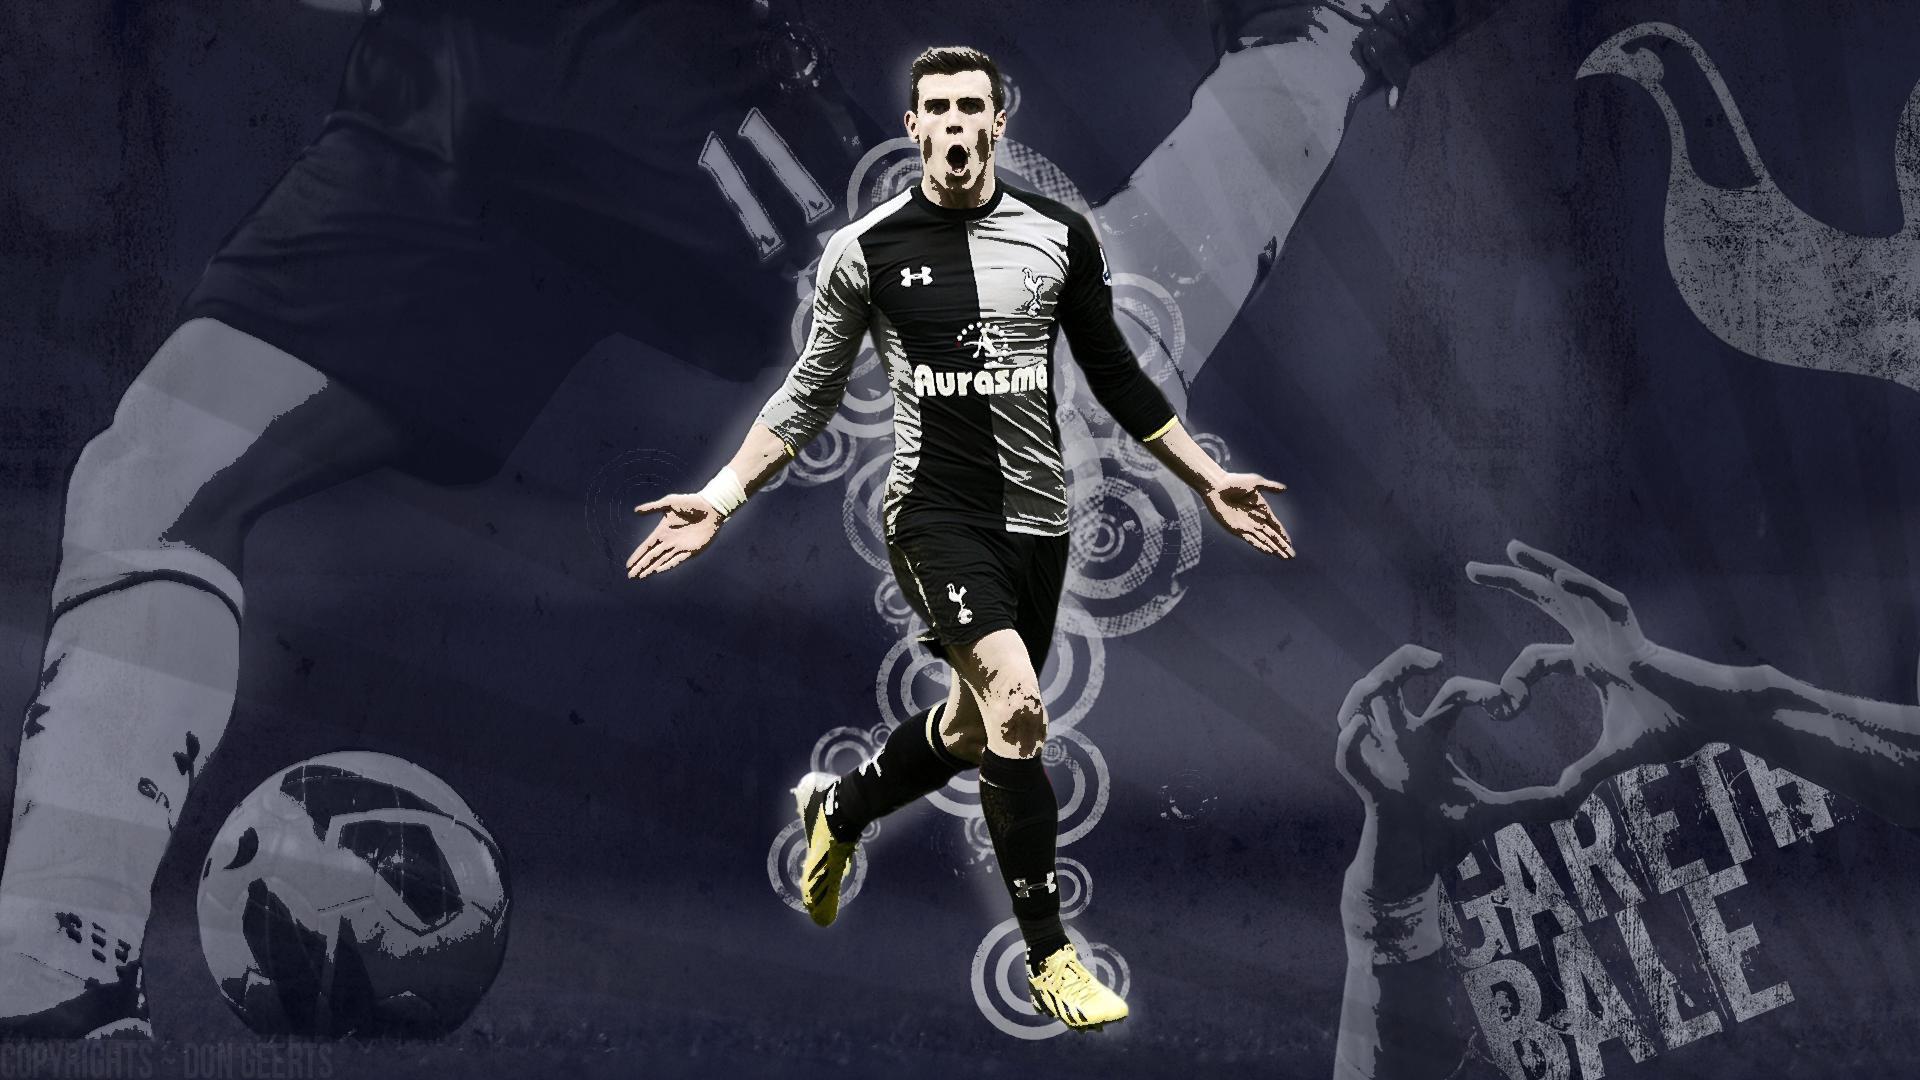 Gareth Bale Wallpaper | Football HD Wallpapers